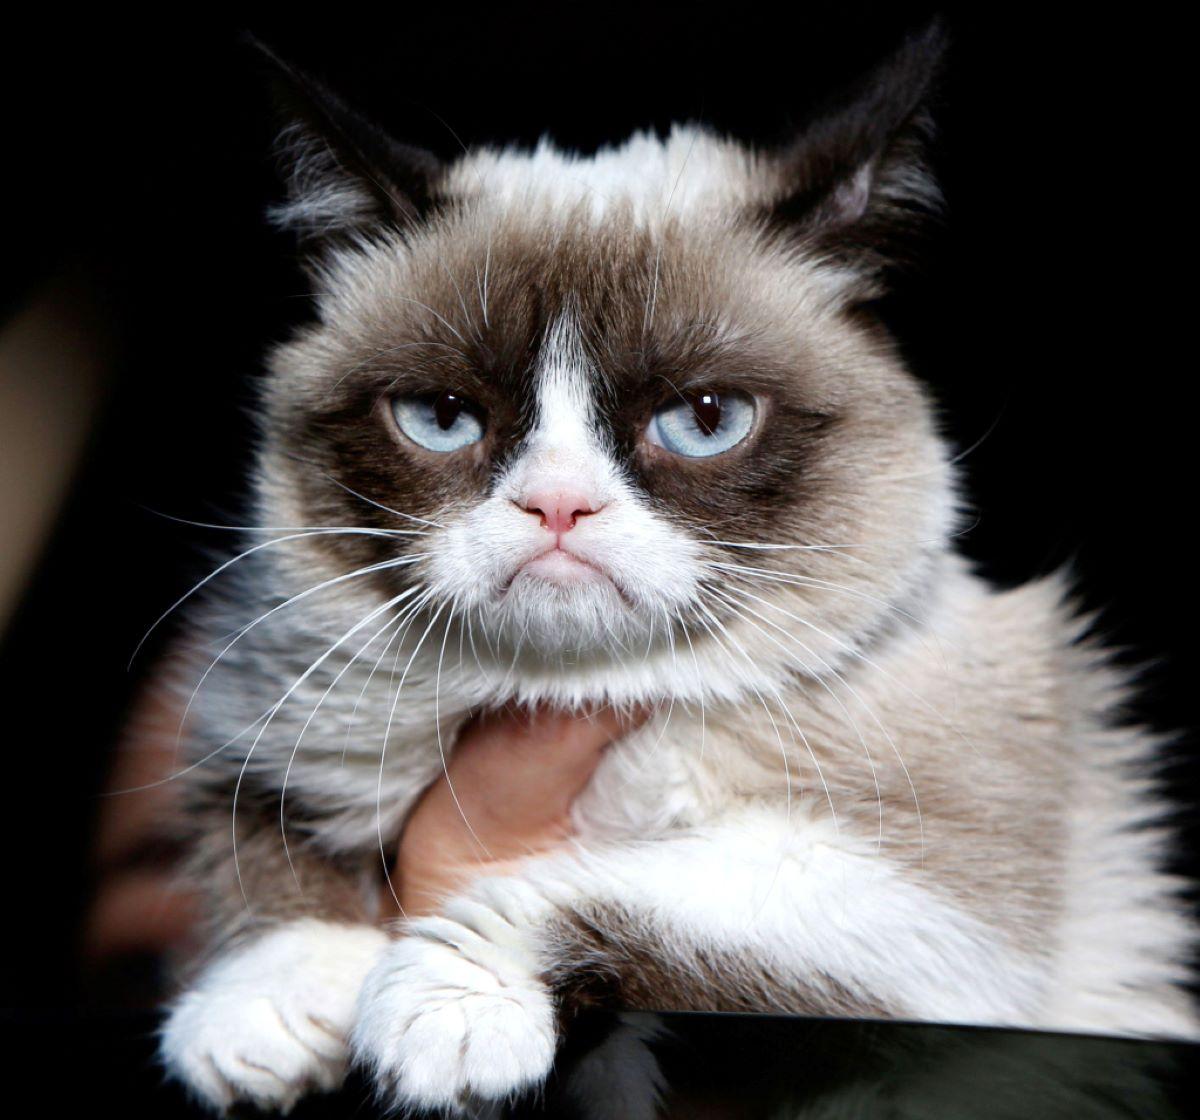 gatto-imbronciato-su-sfondo-nero